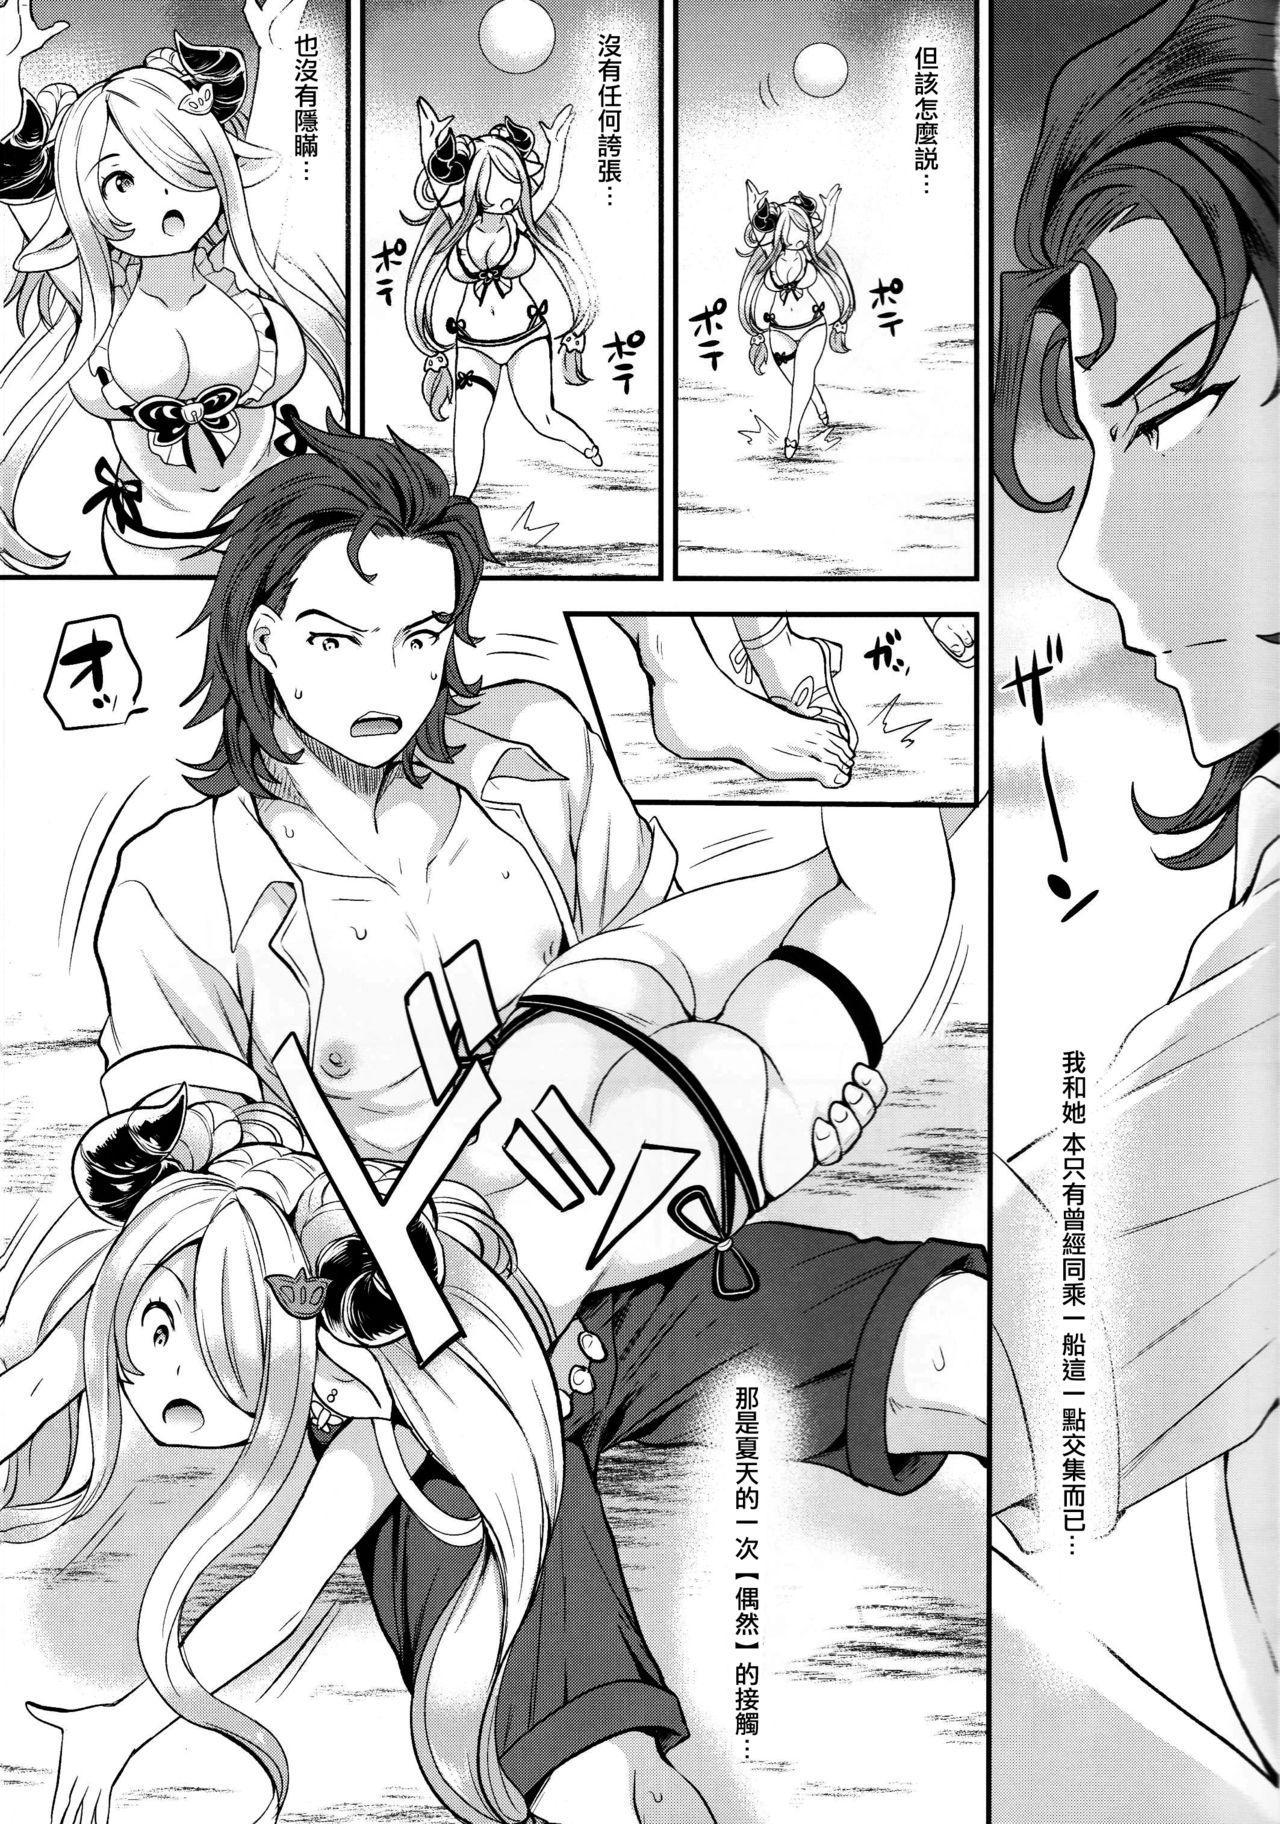 (C91) [Momoiro-Rip (Sugar Milk)] Onee-san to Per-chan (Granblue Fantasy) [Chinese] [沒有漢化] 3